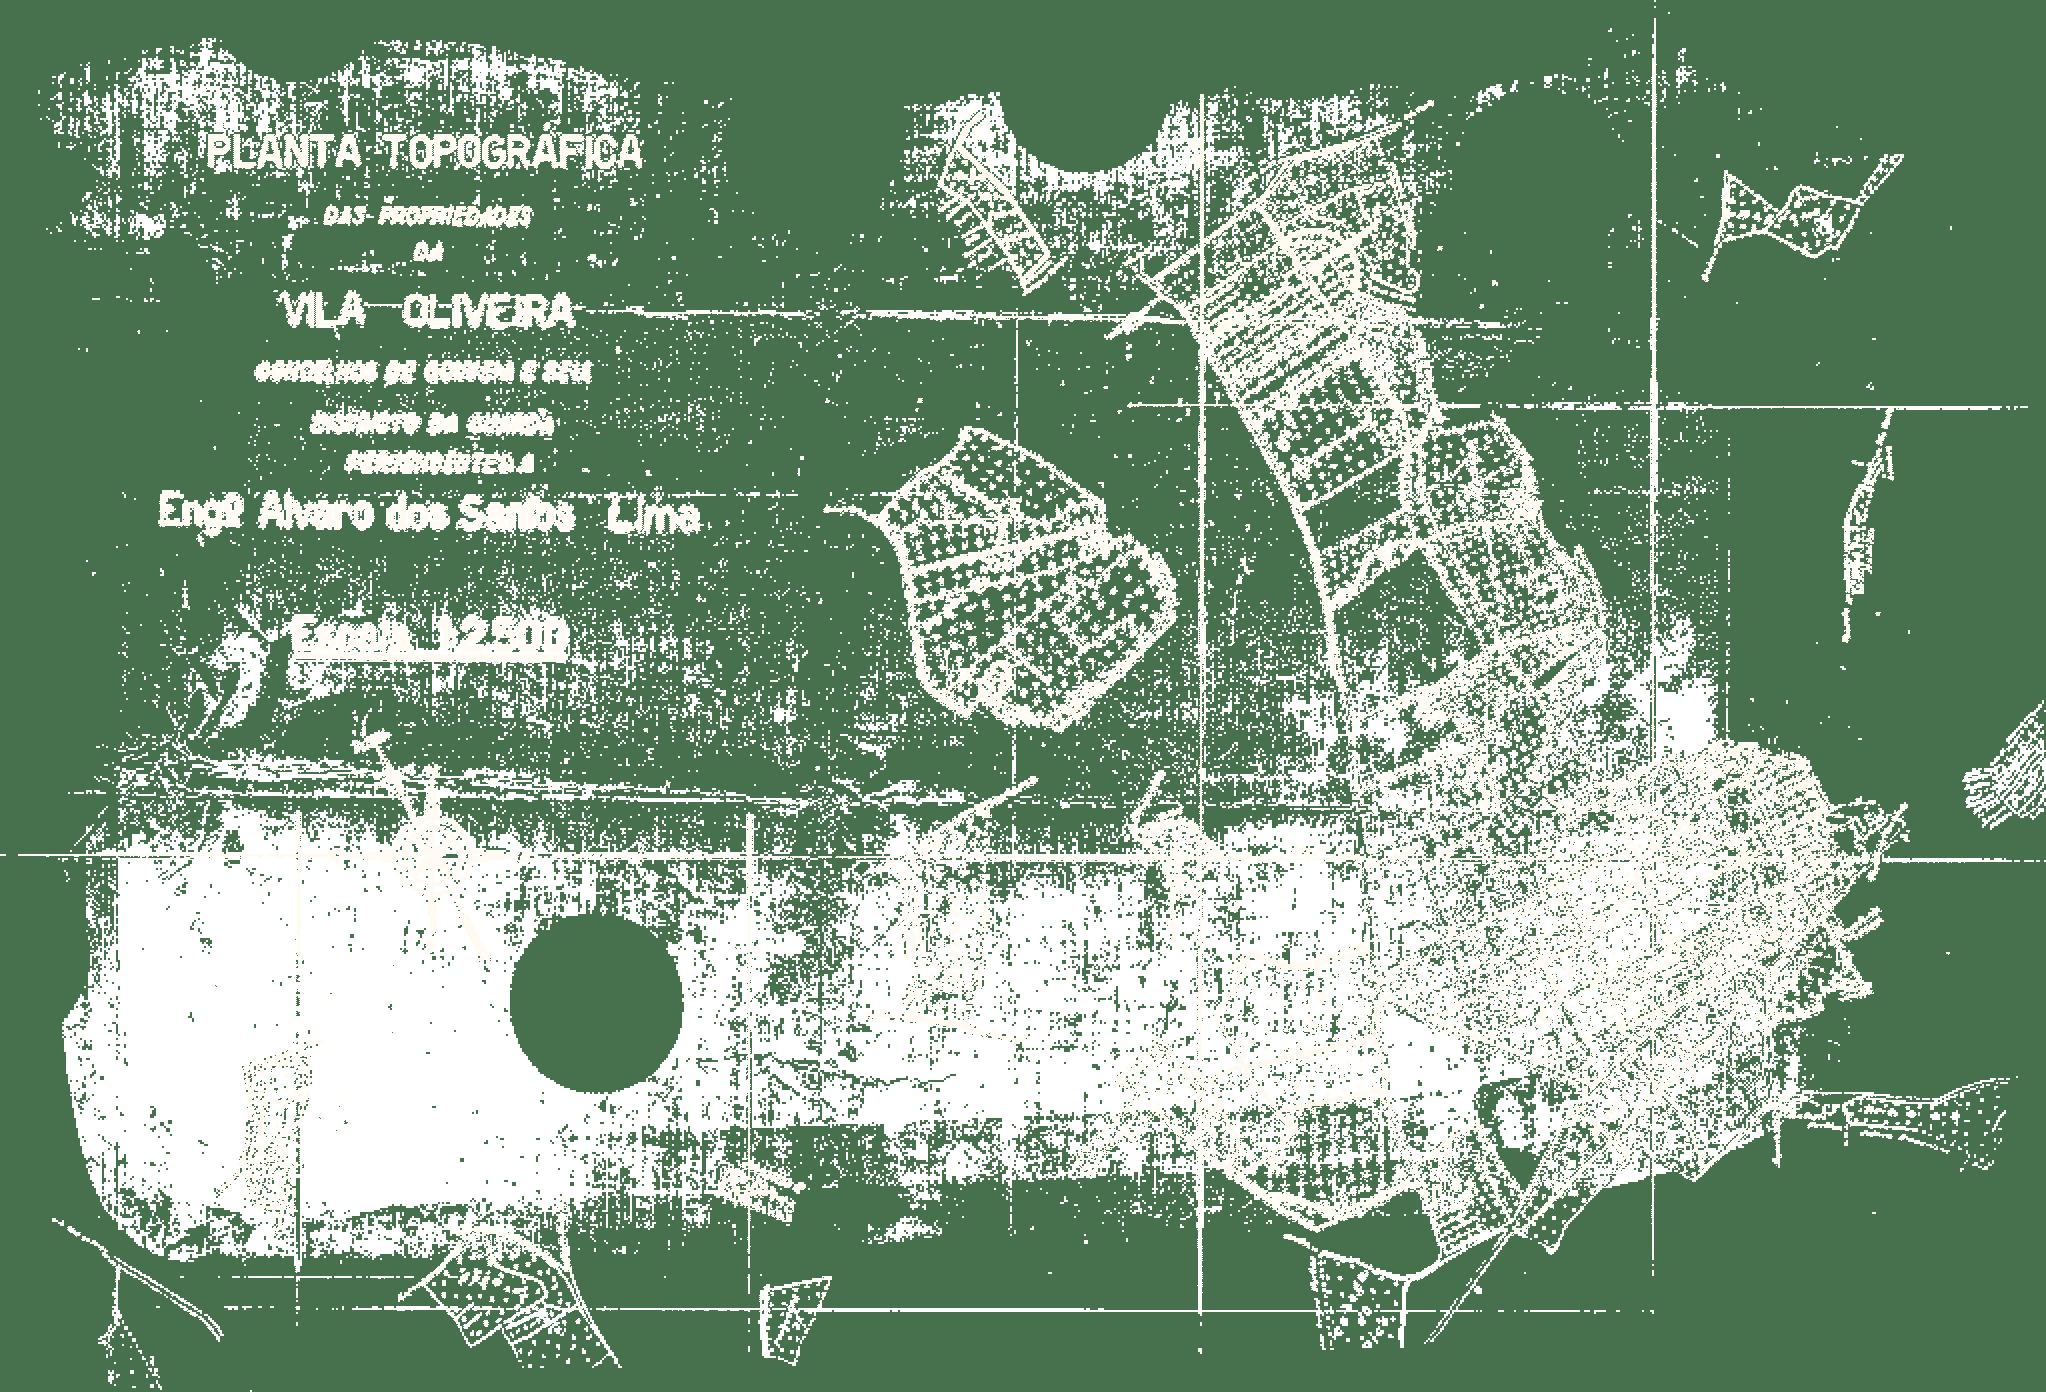 Planta topográfica